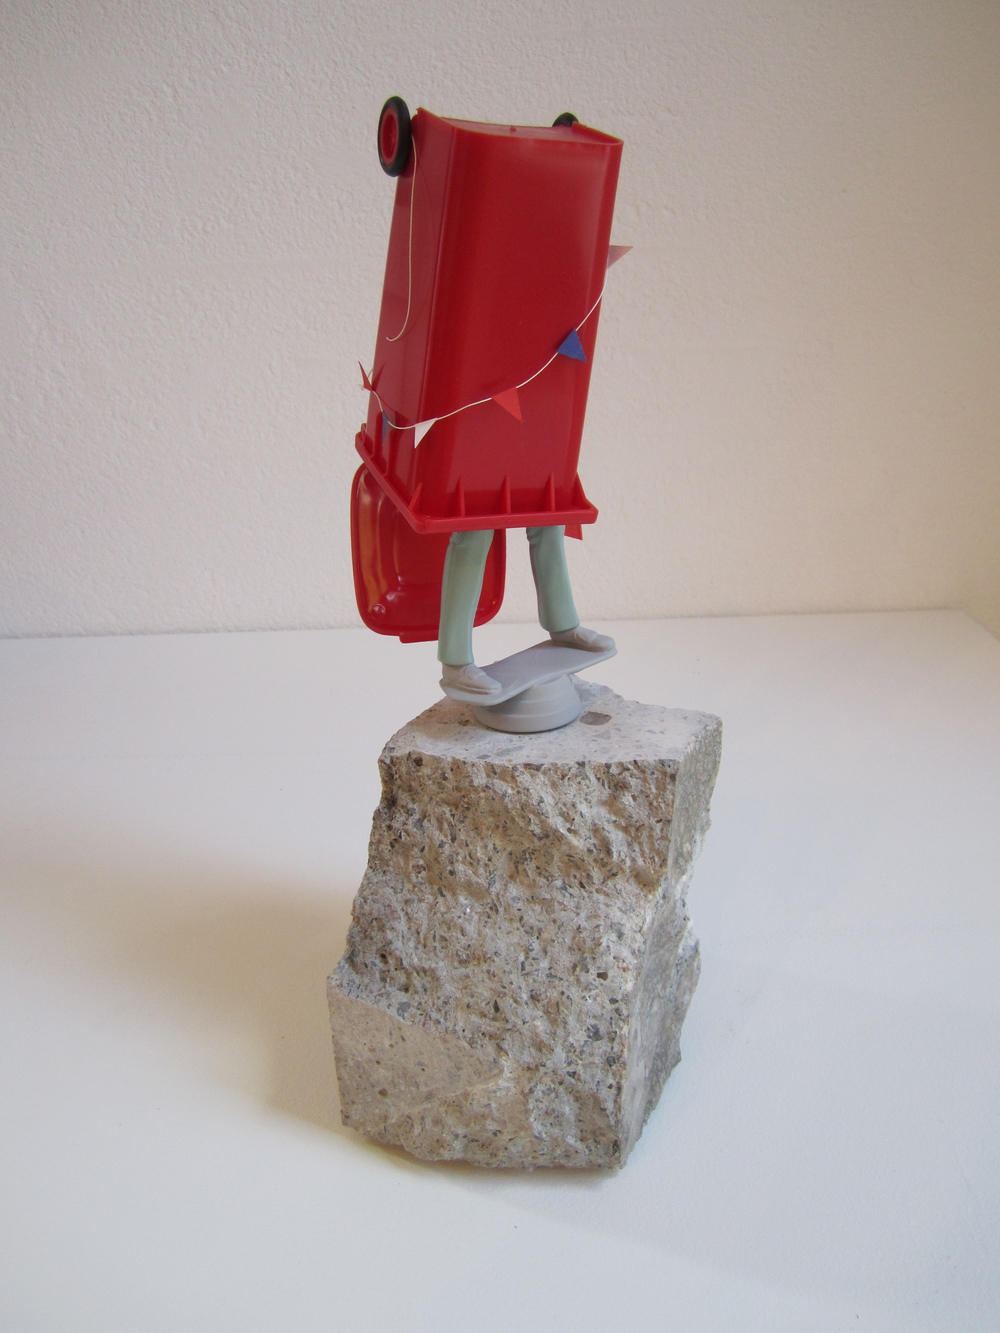 Costume, 2011    Enamel on acrylic, concrete, plastic, paper, string 38 x 20 x 19 cm